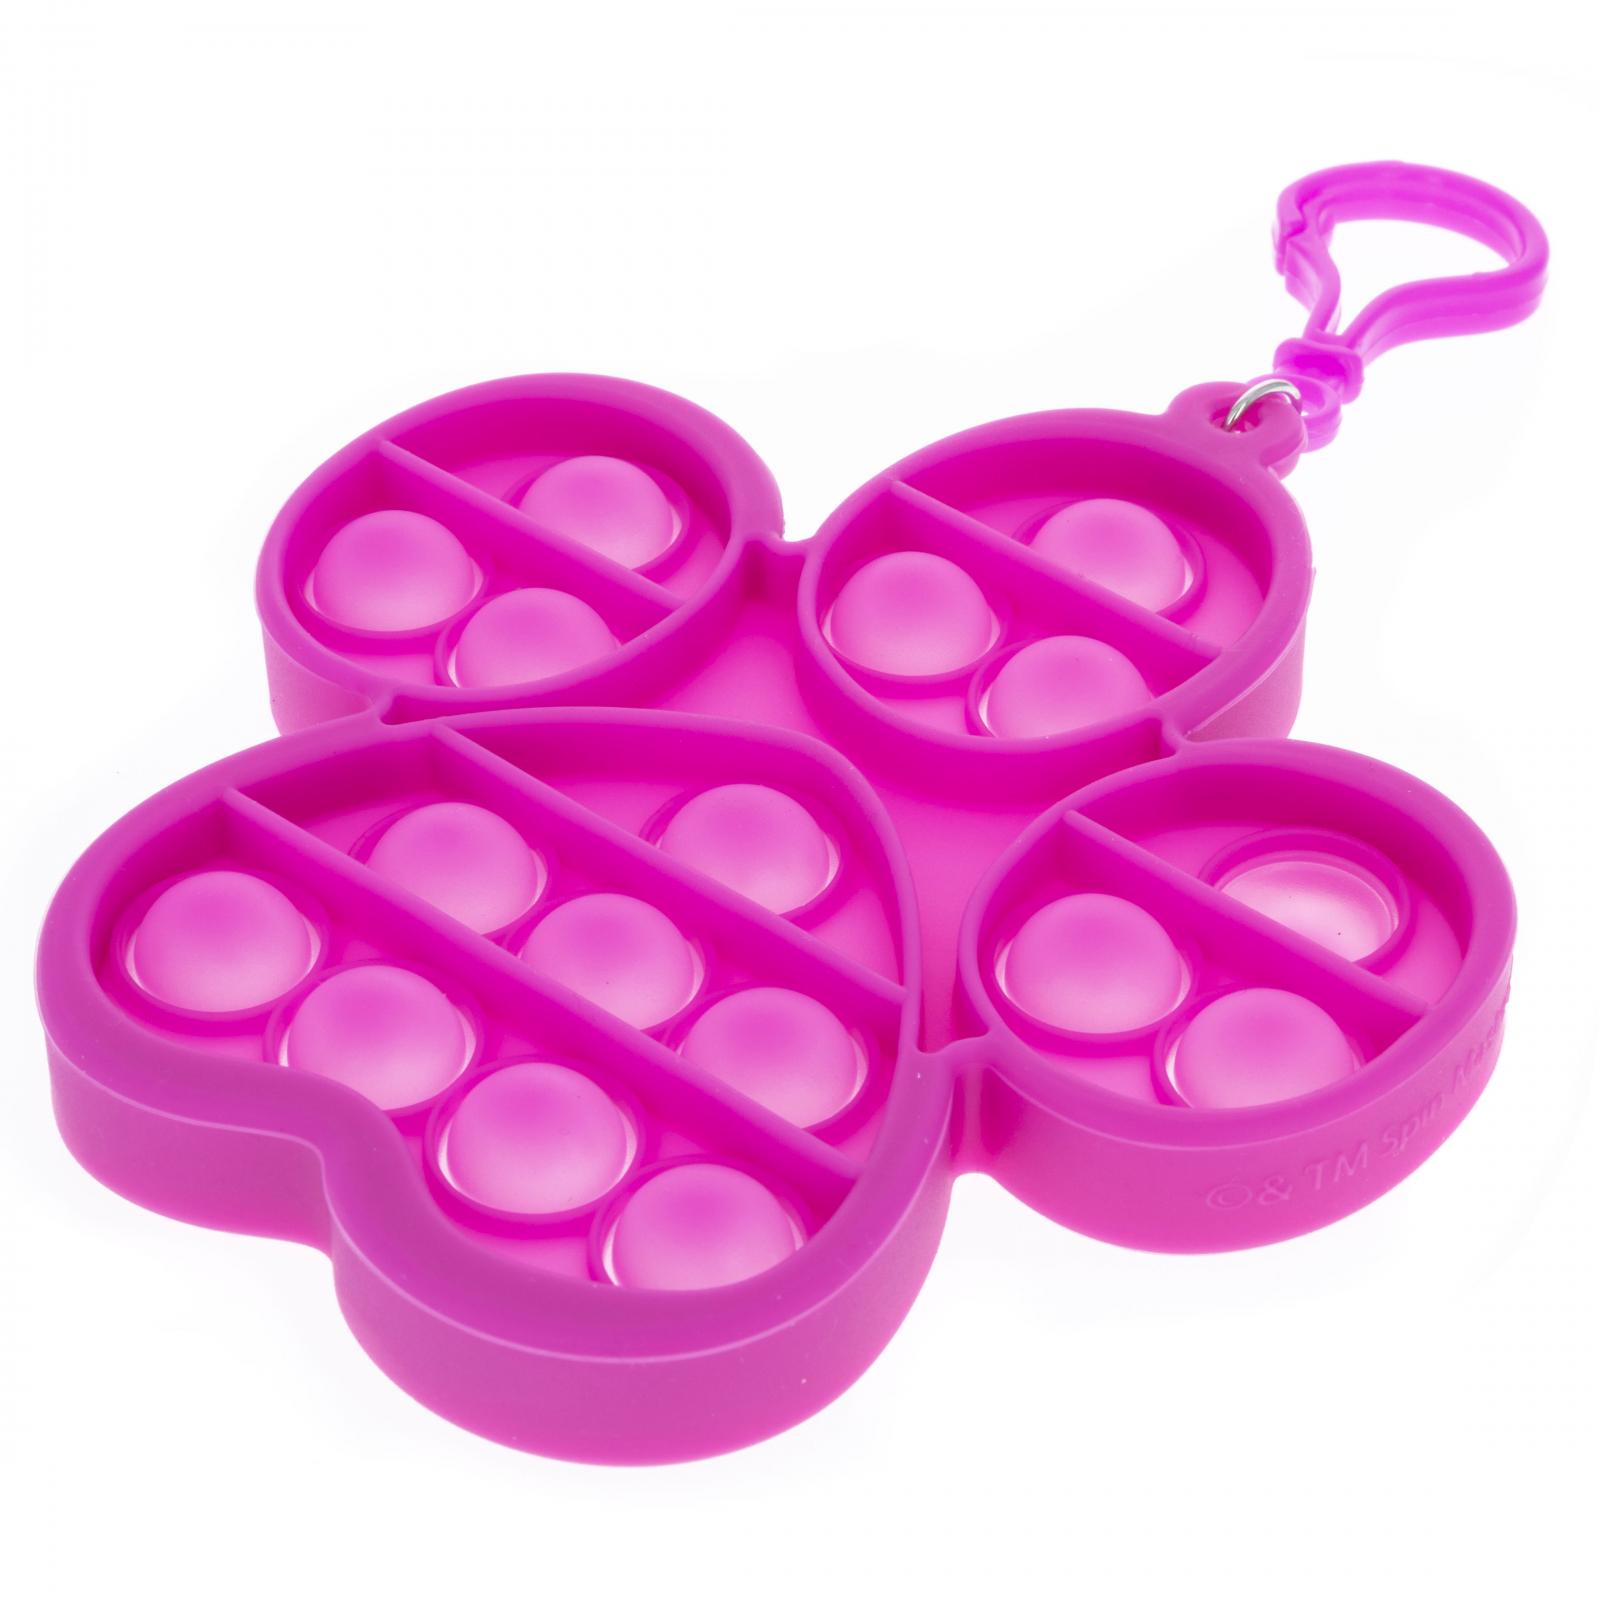 Paw Patrol Push Pop It Sensory Fidget Toy Stress Relief Pink